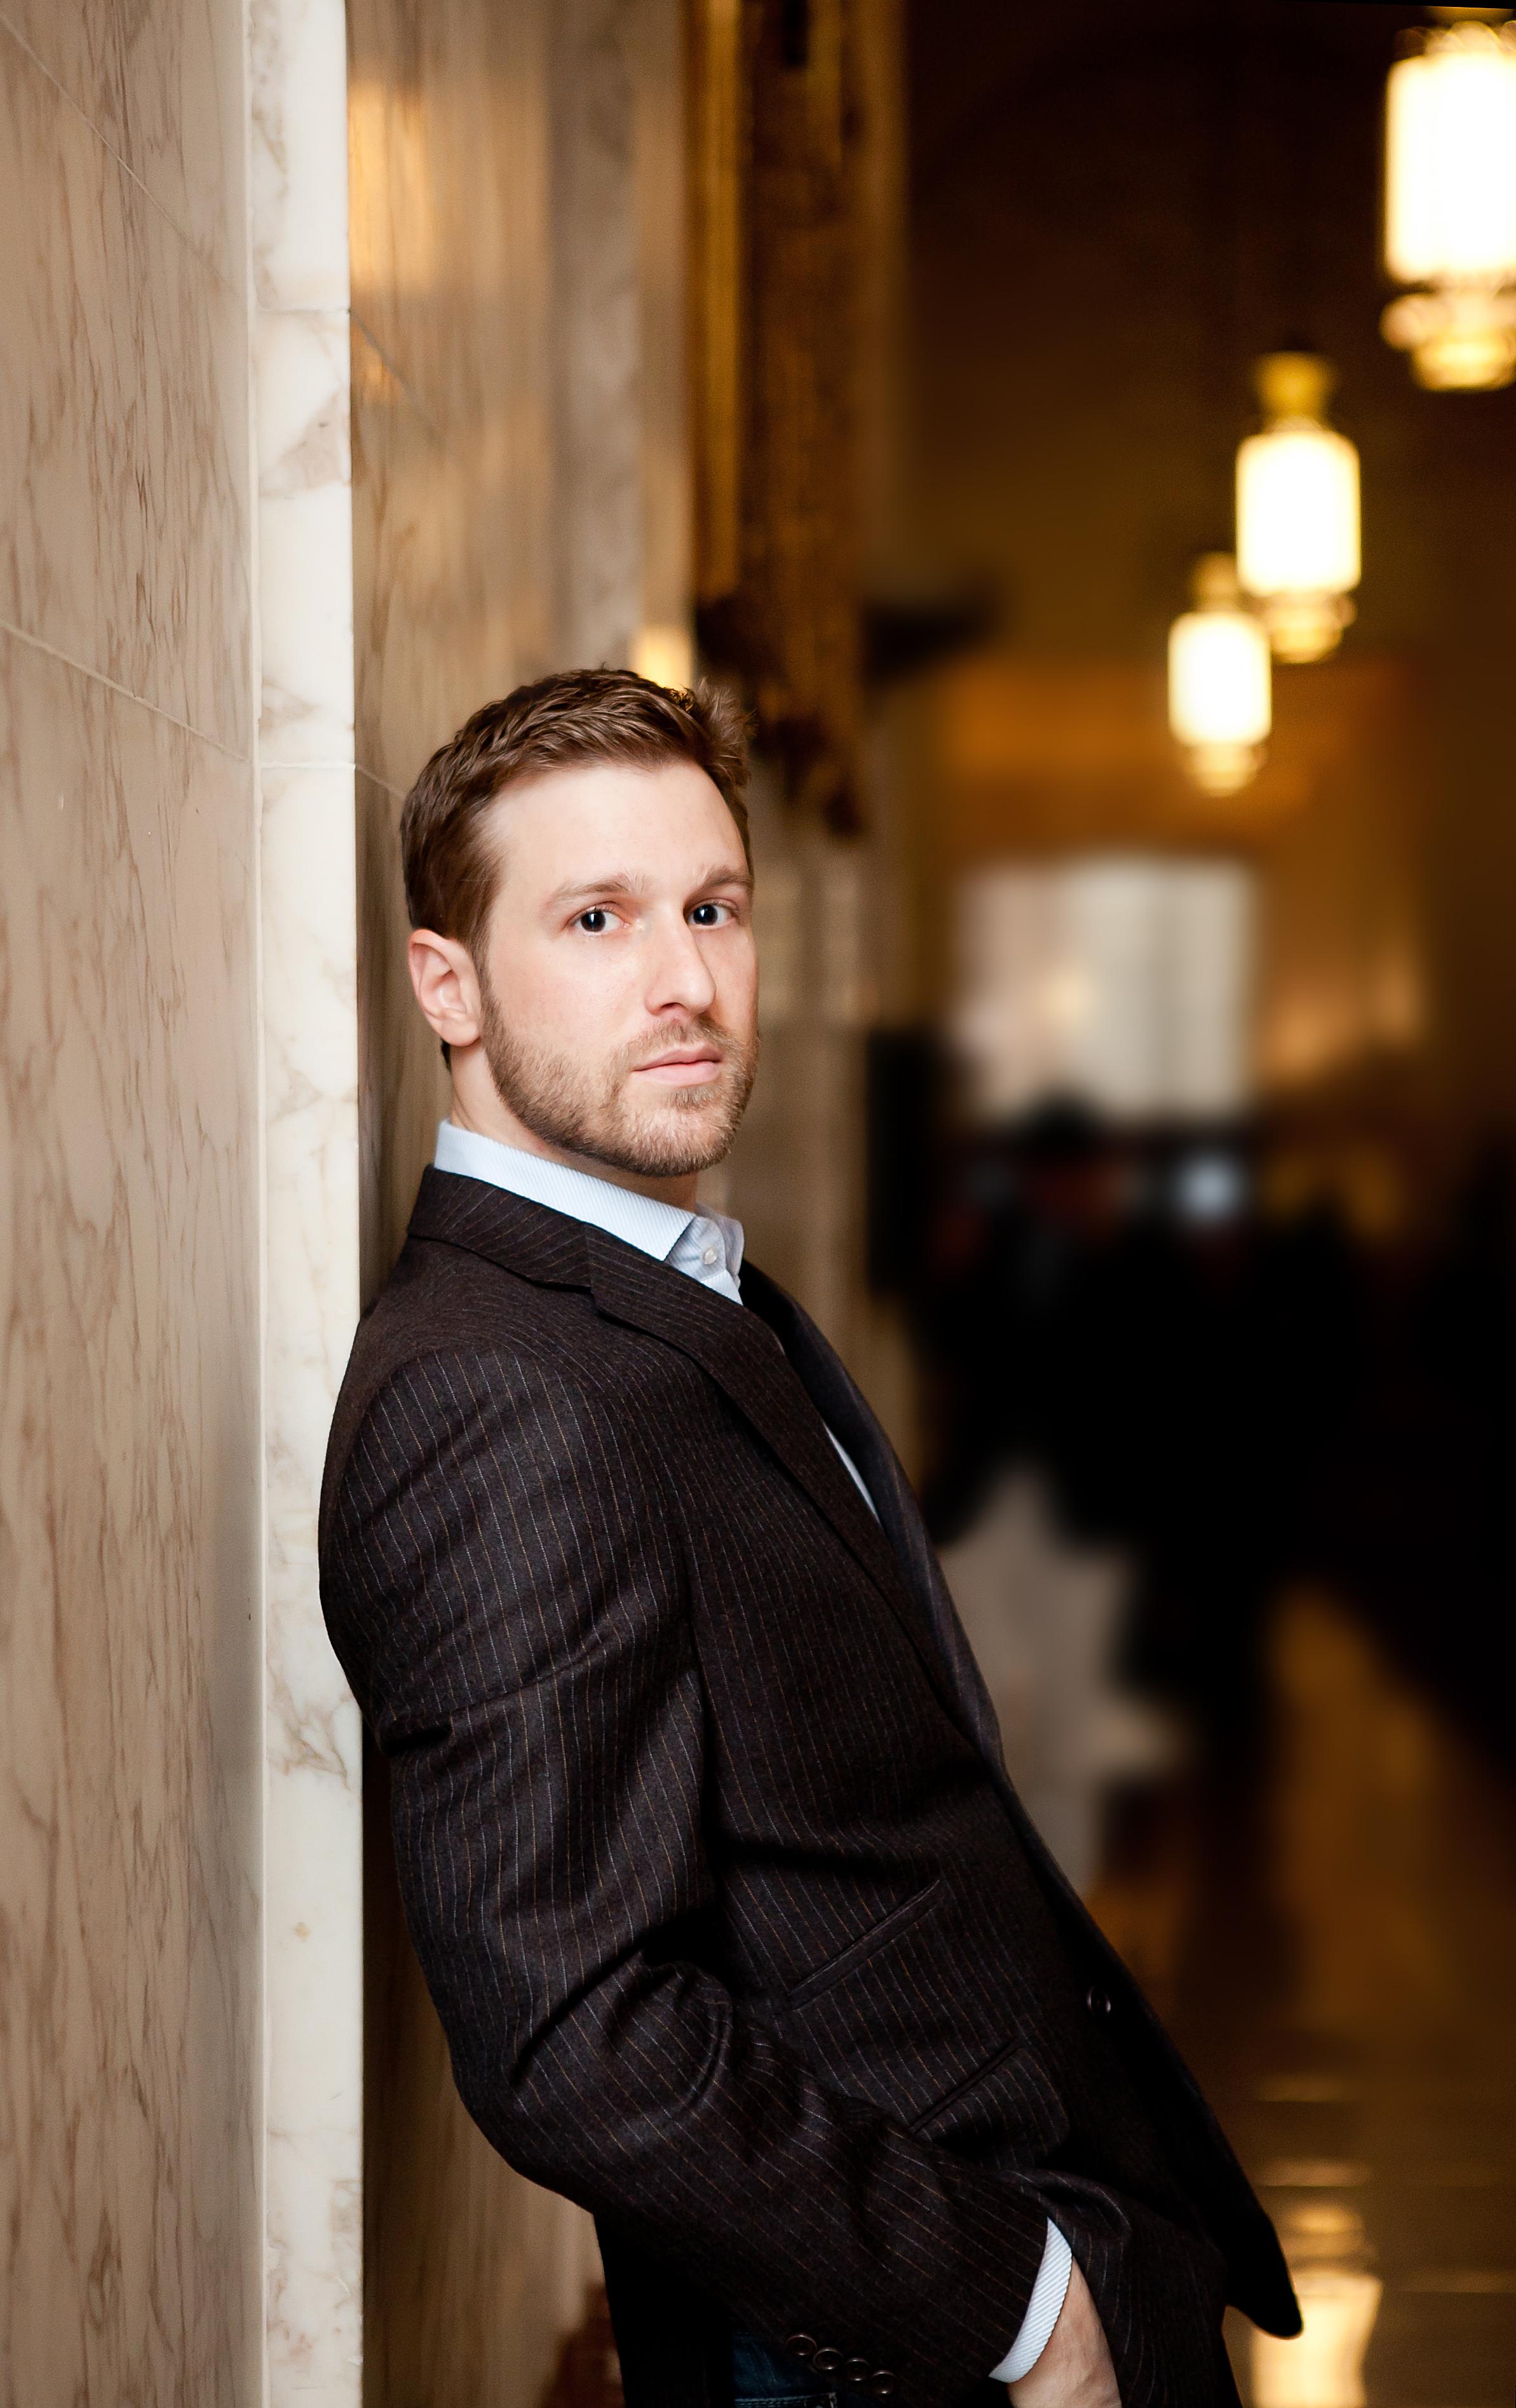 Jesse Blumberg, Baritone (Photo: Arielle Doneson)